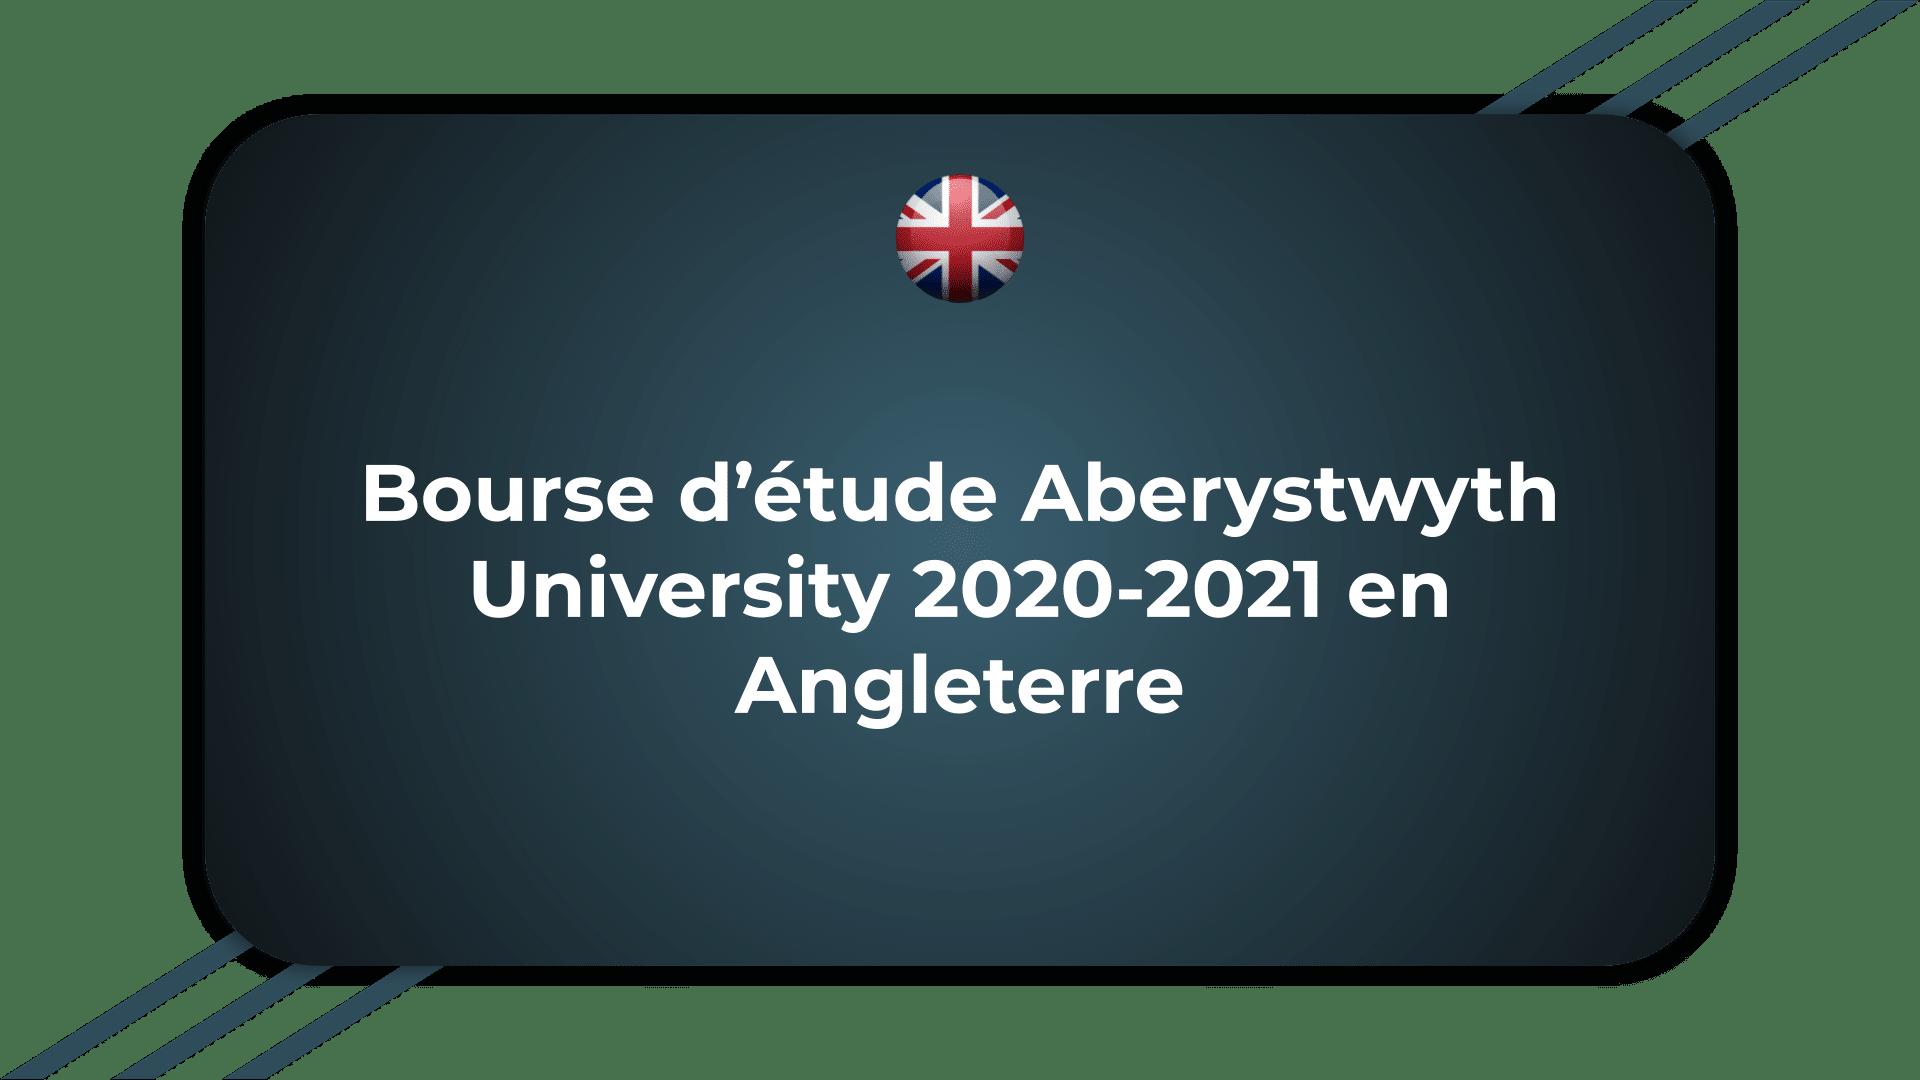 Bourse d'étude Aberystwyth University